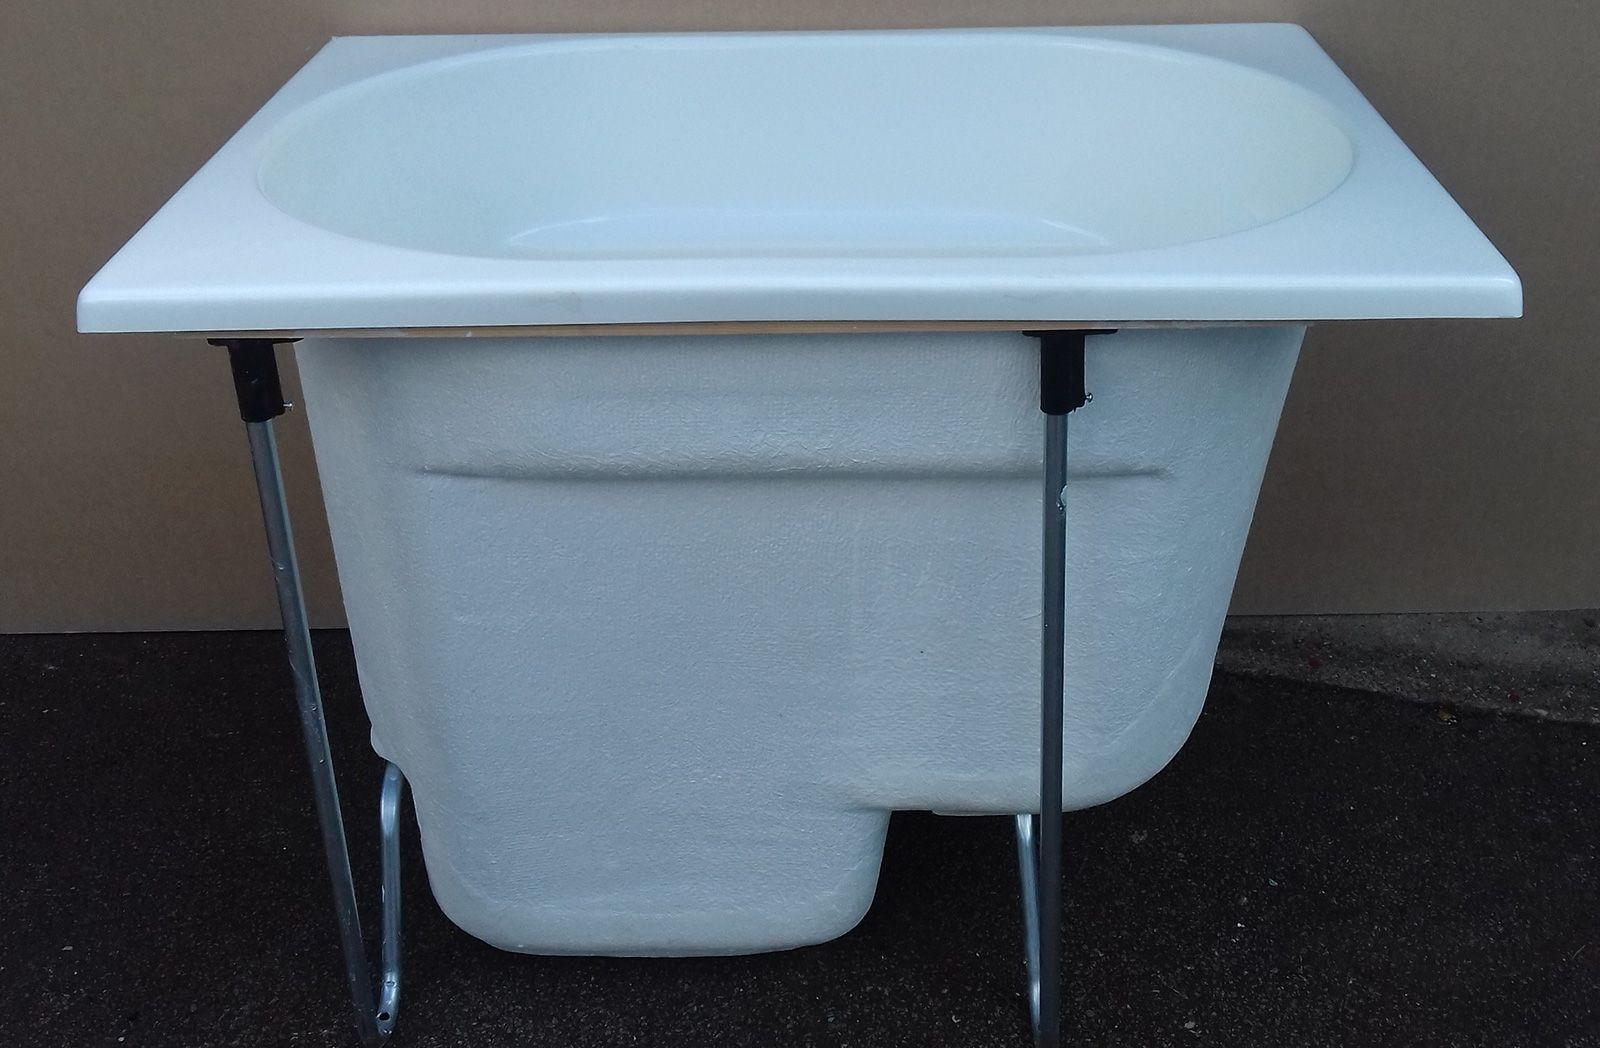 Compact Soaking Tub. Compact Bath Tubs P In Wonderful Home ...